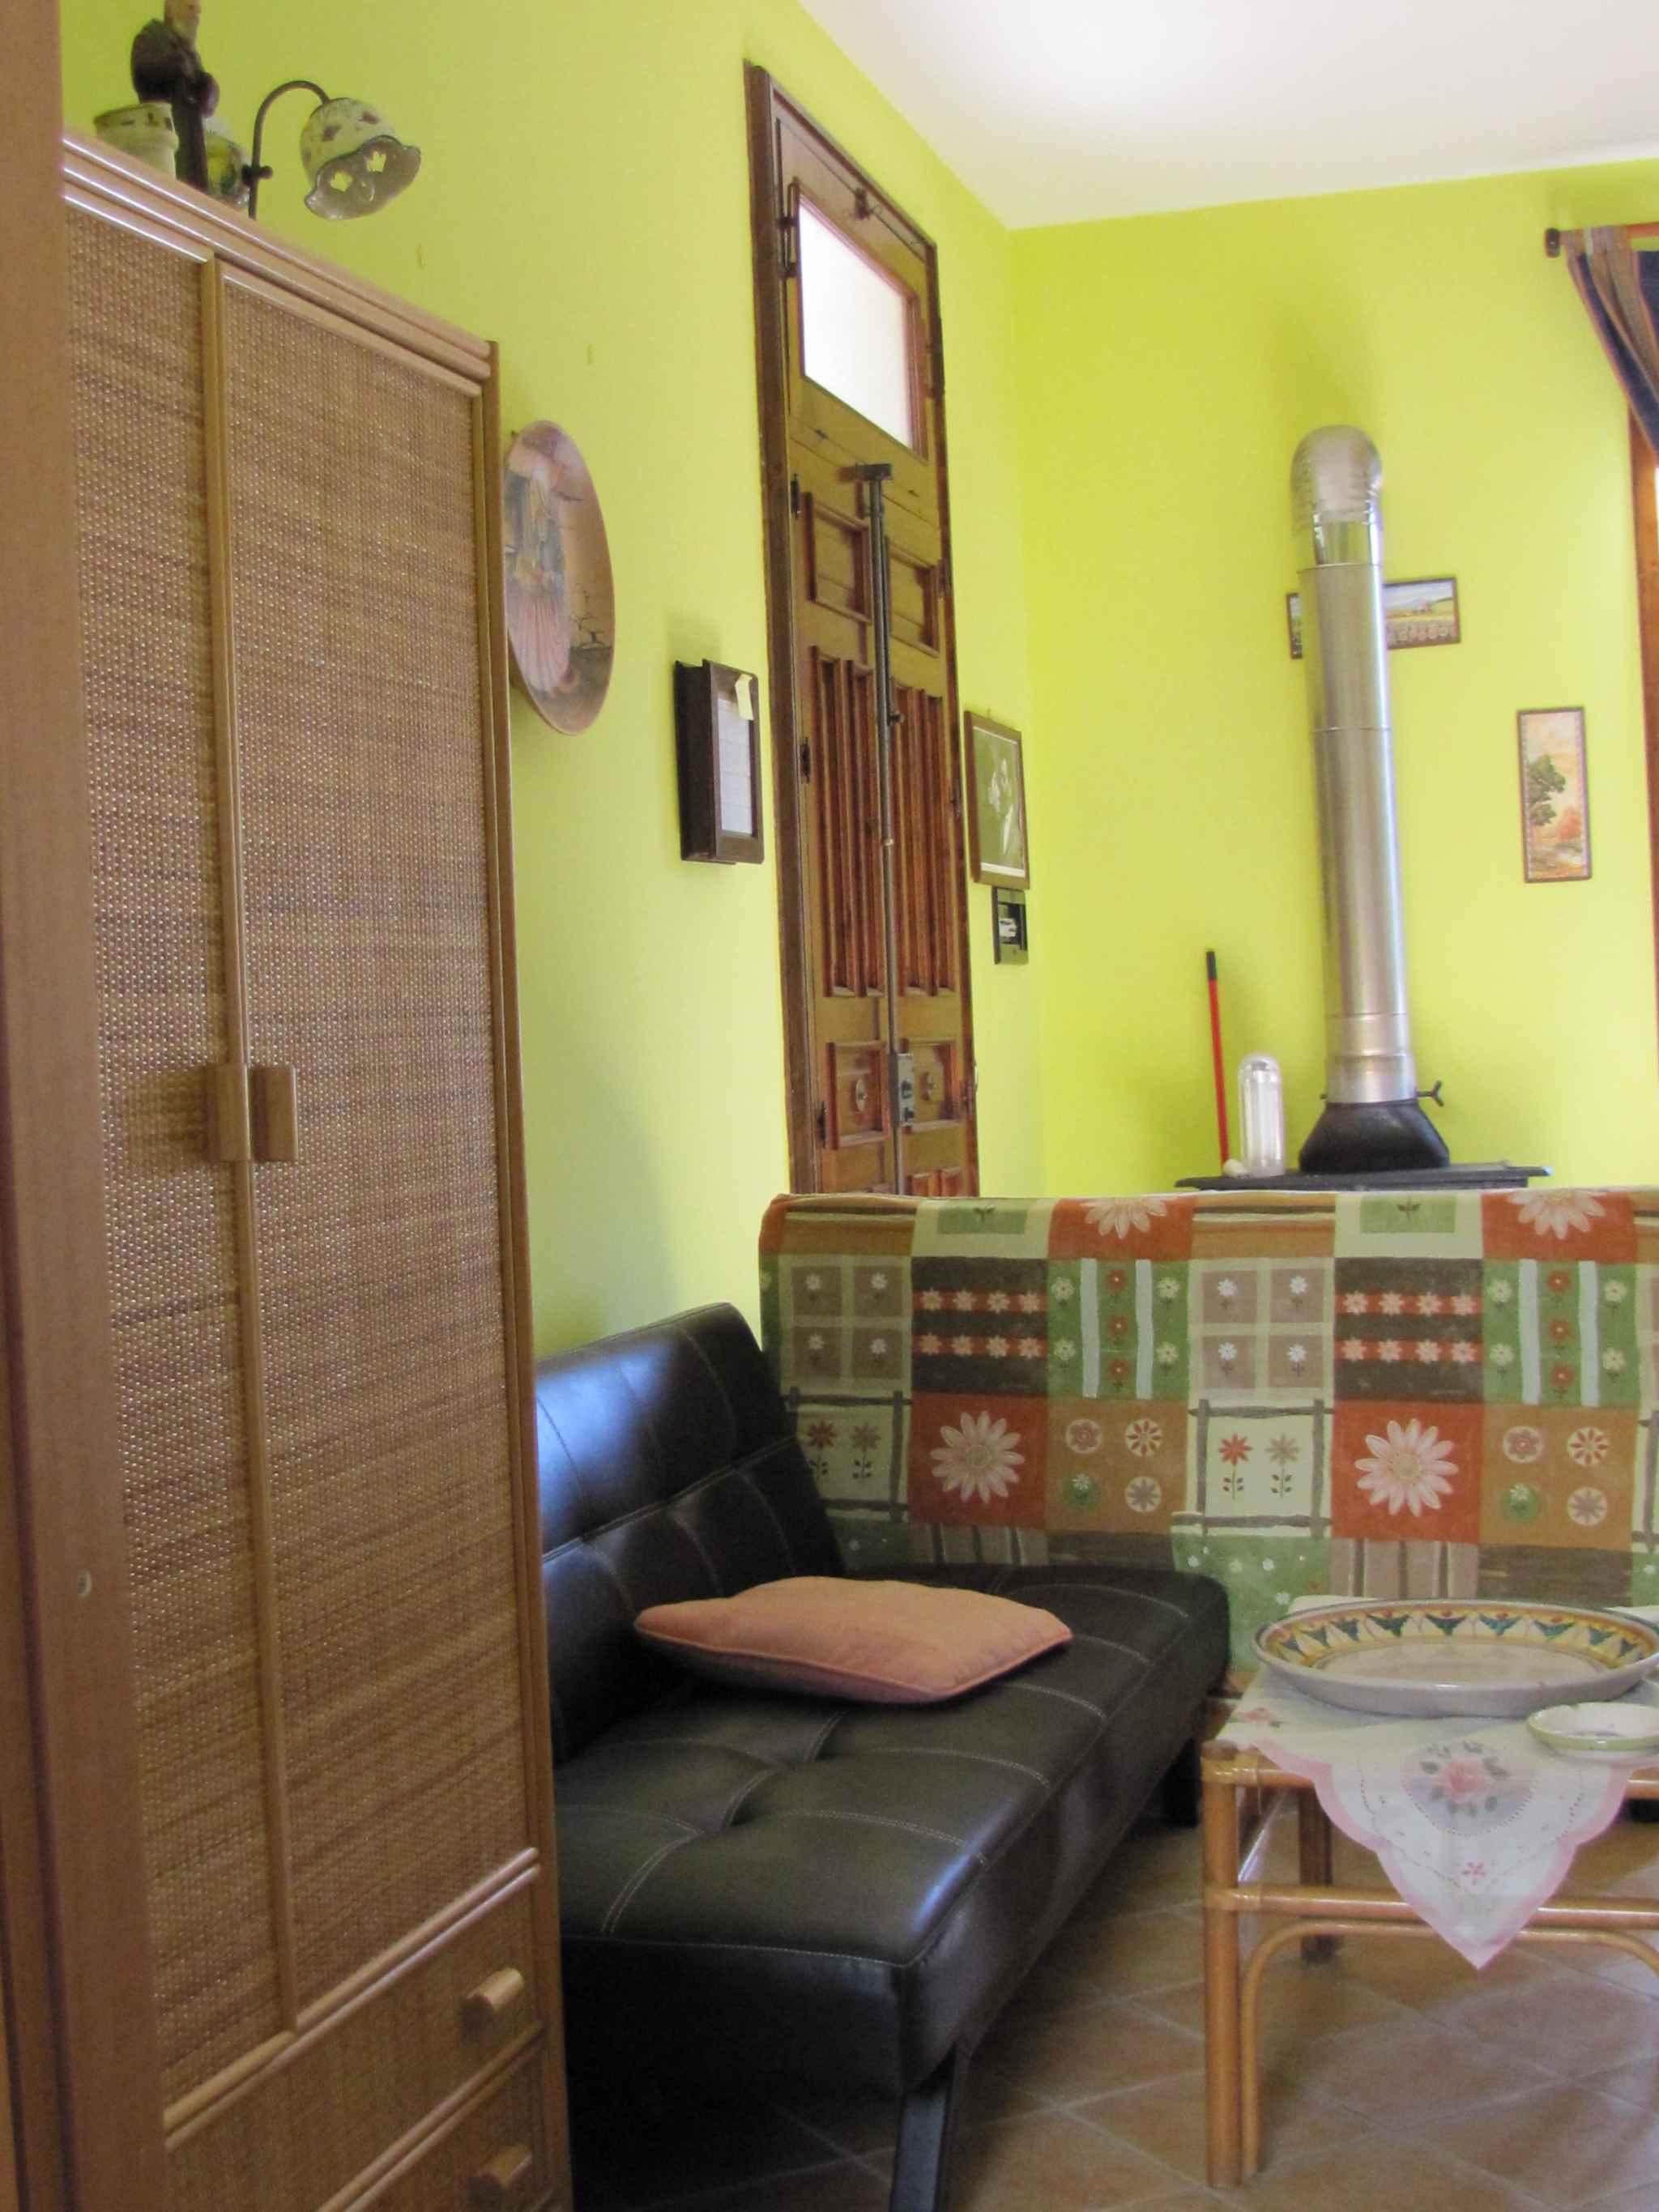 Maison de vacances mit Blick auf Zitronengarten (317534), Lido di Noto, Siracusa, Sicile, Italie, image 24